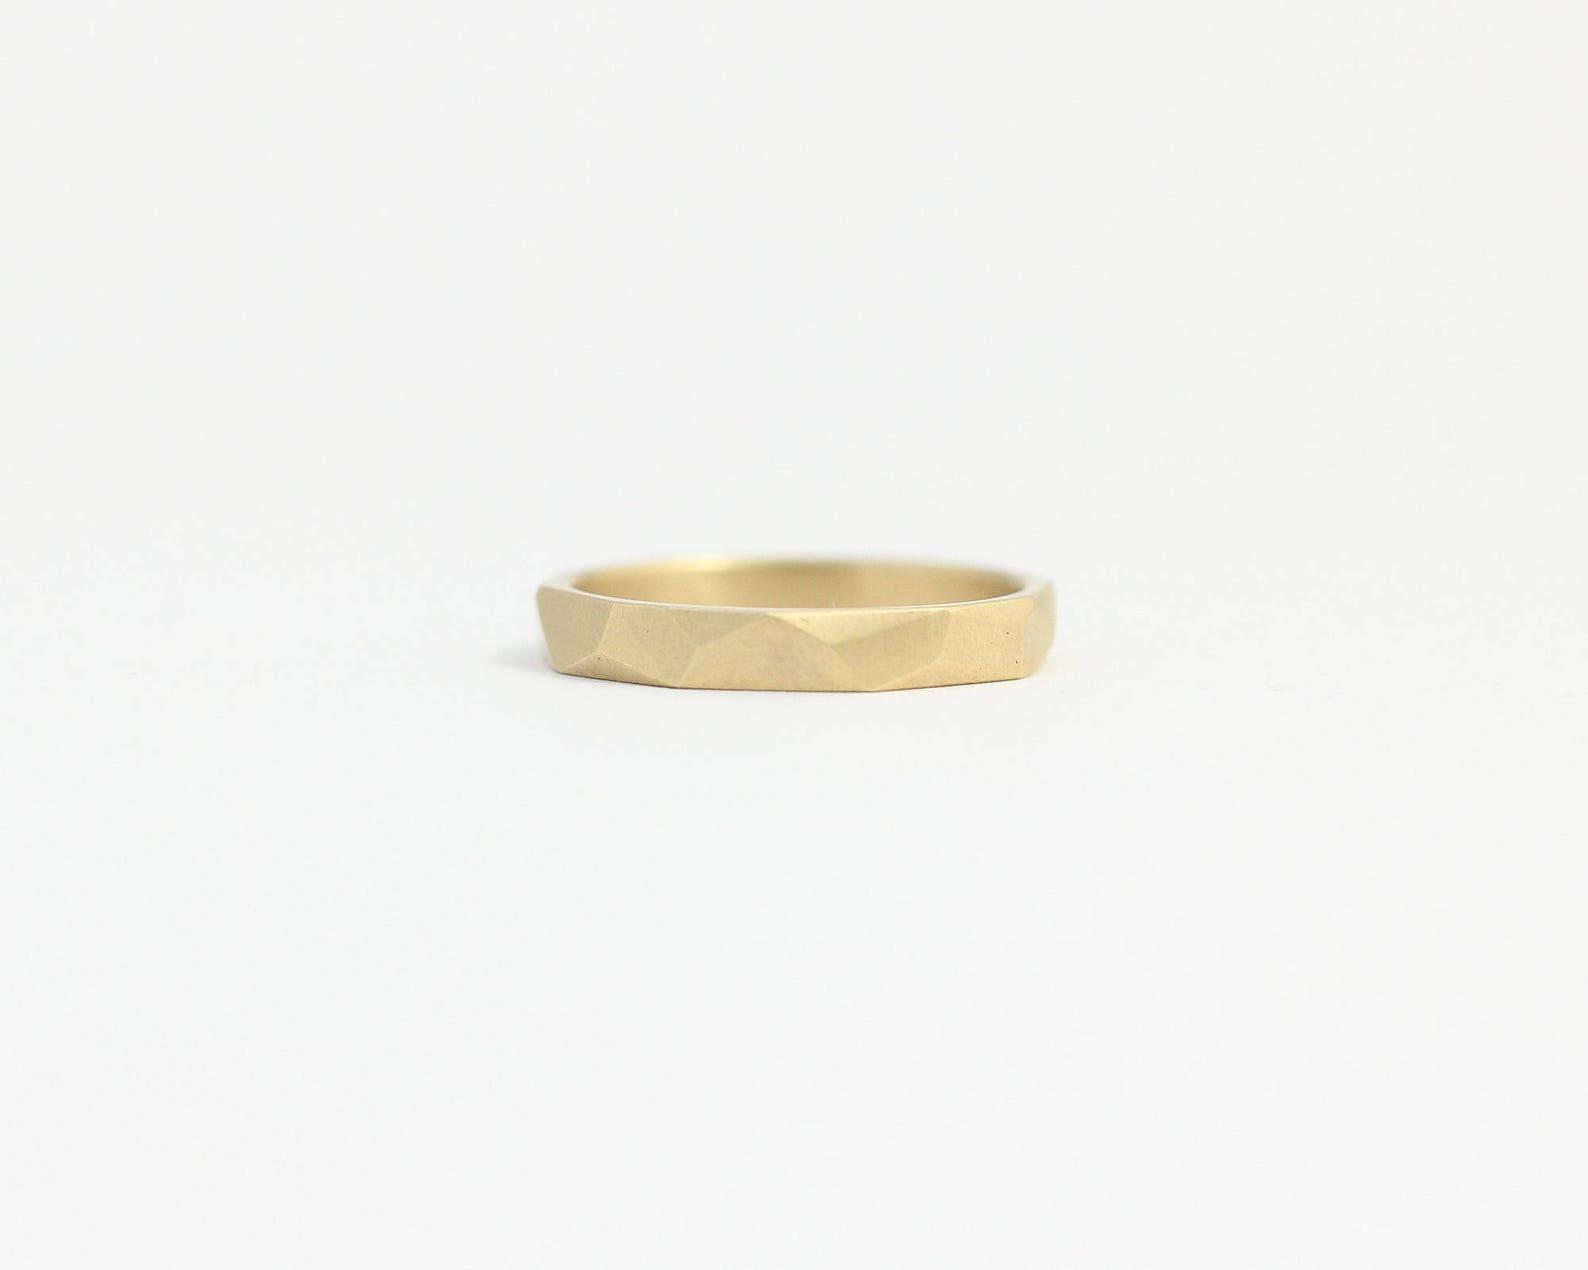 Ehering gold mit Muster